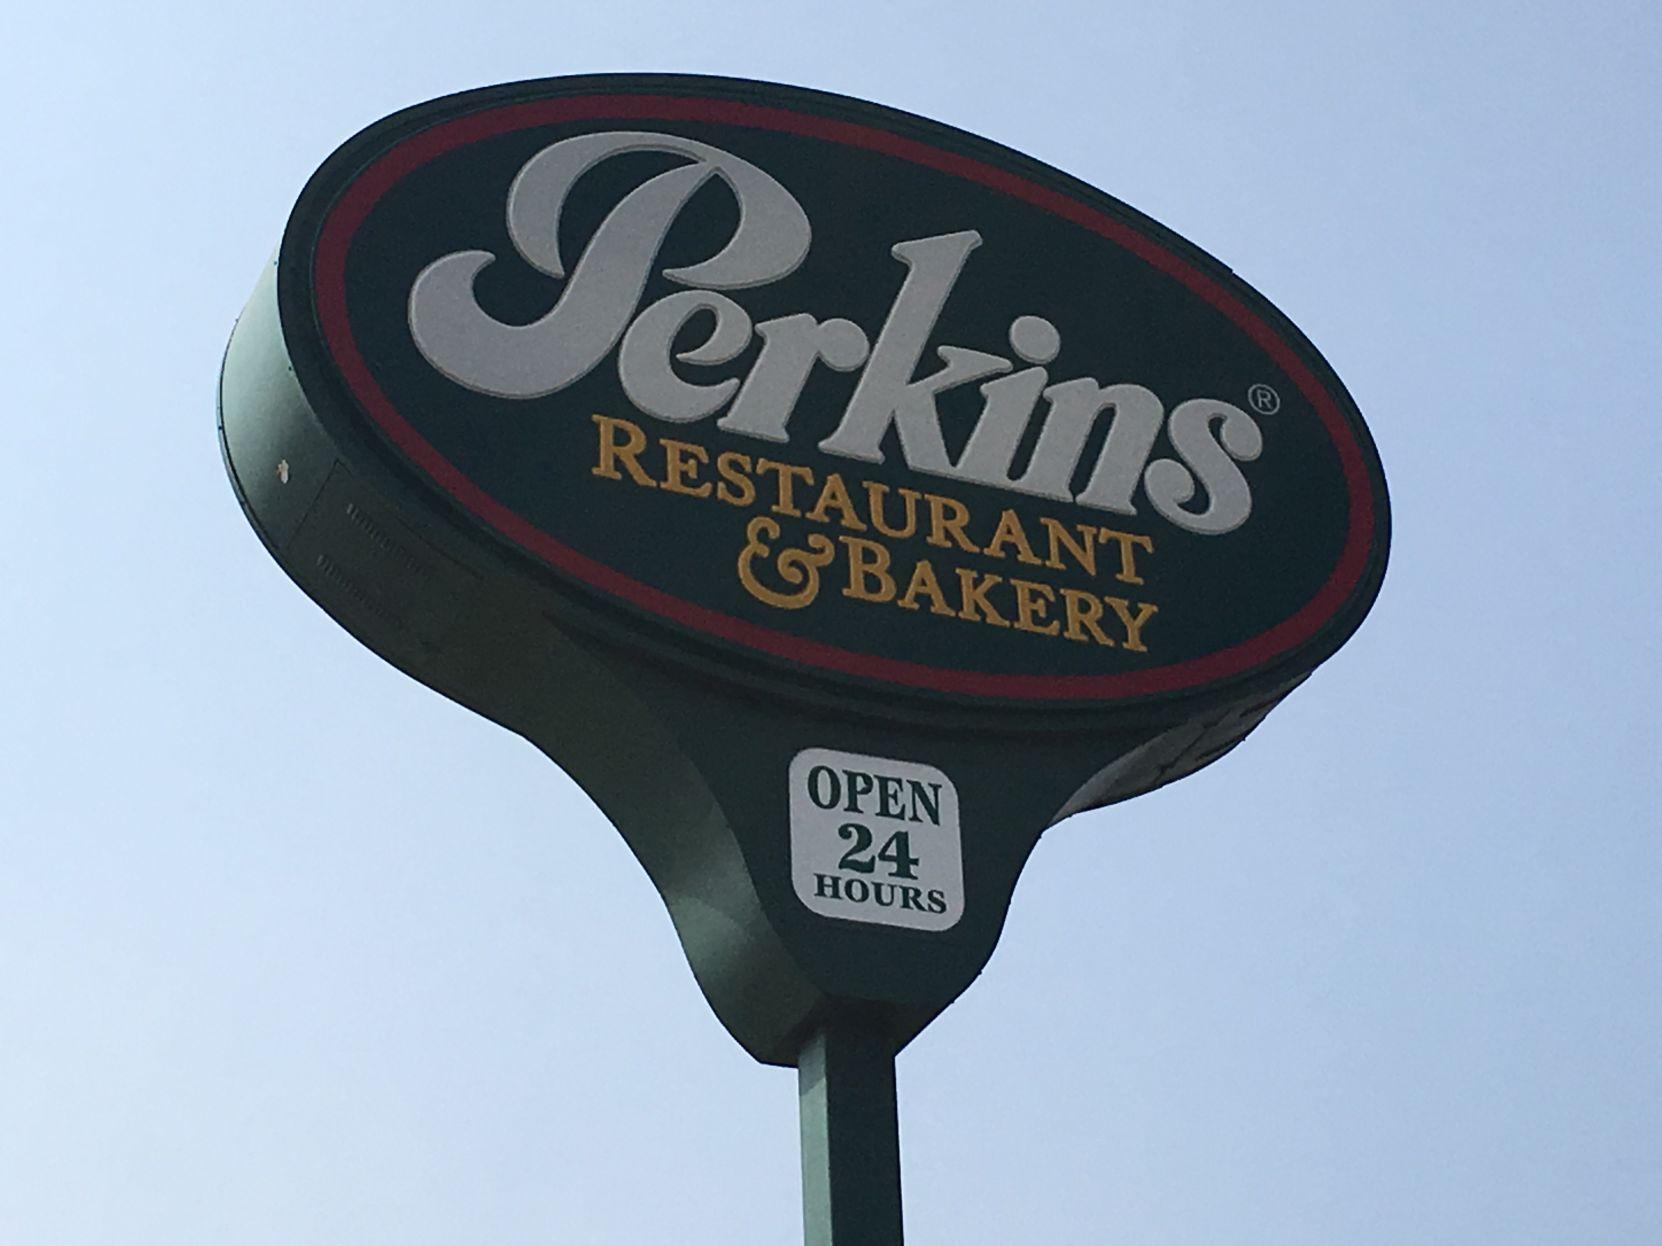 GILDA: Perkins restaurant hudson wi